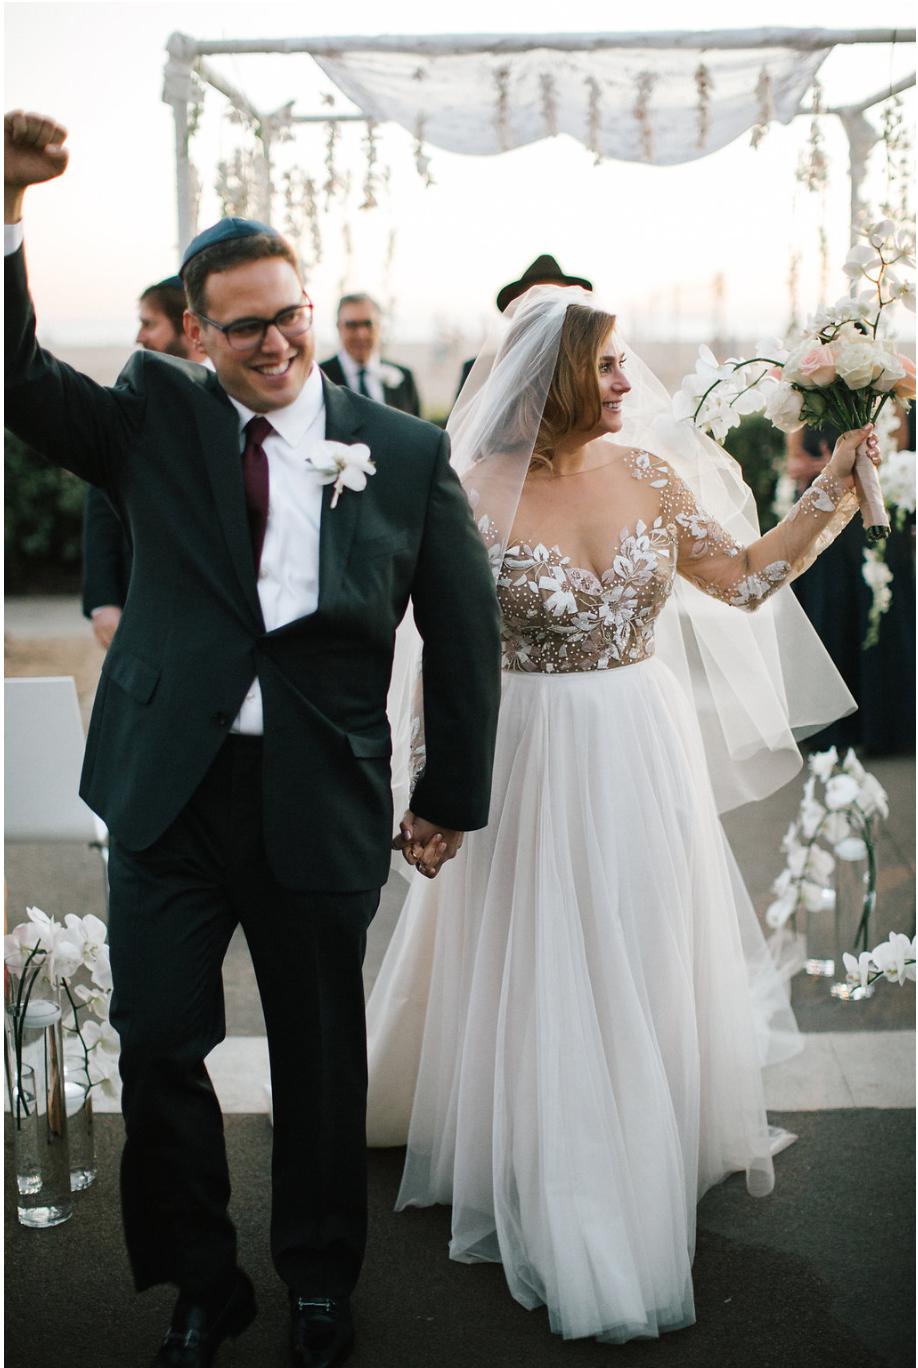 Koryn-Jason-Jewish-Wedding-California-Beaux-Arts-Photographie-Nov-2016-09.png